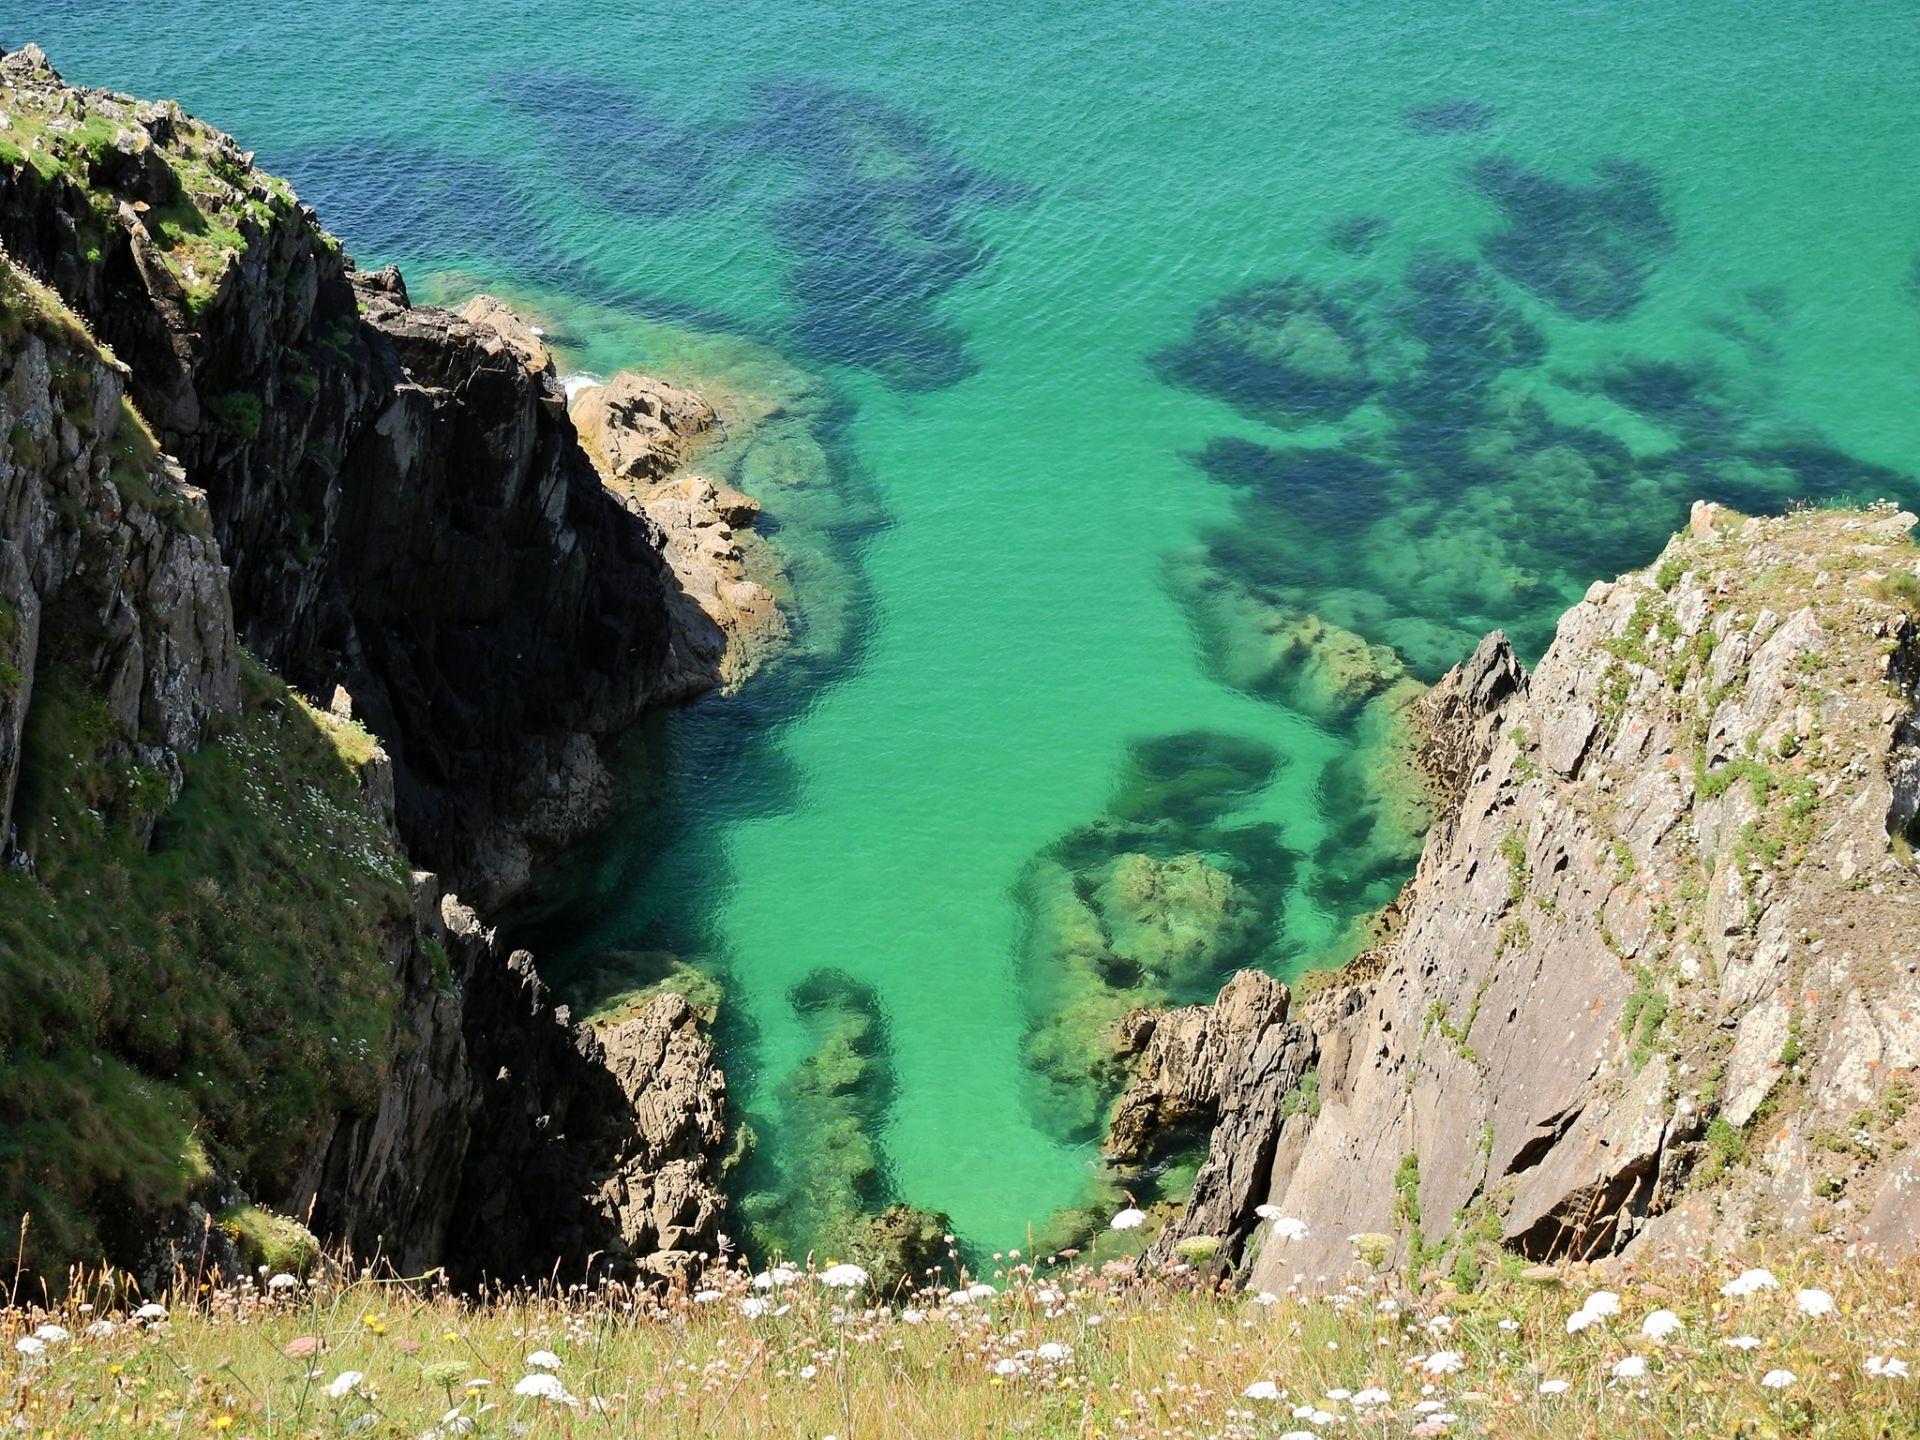 paysage breton, bord de mer, océan